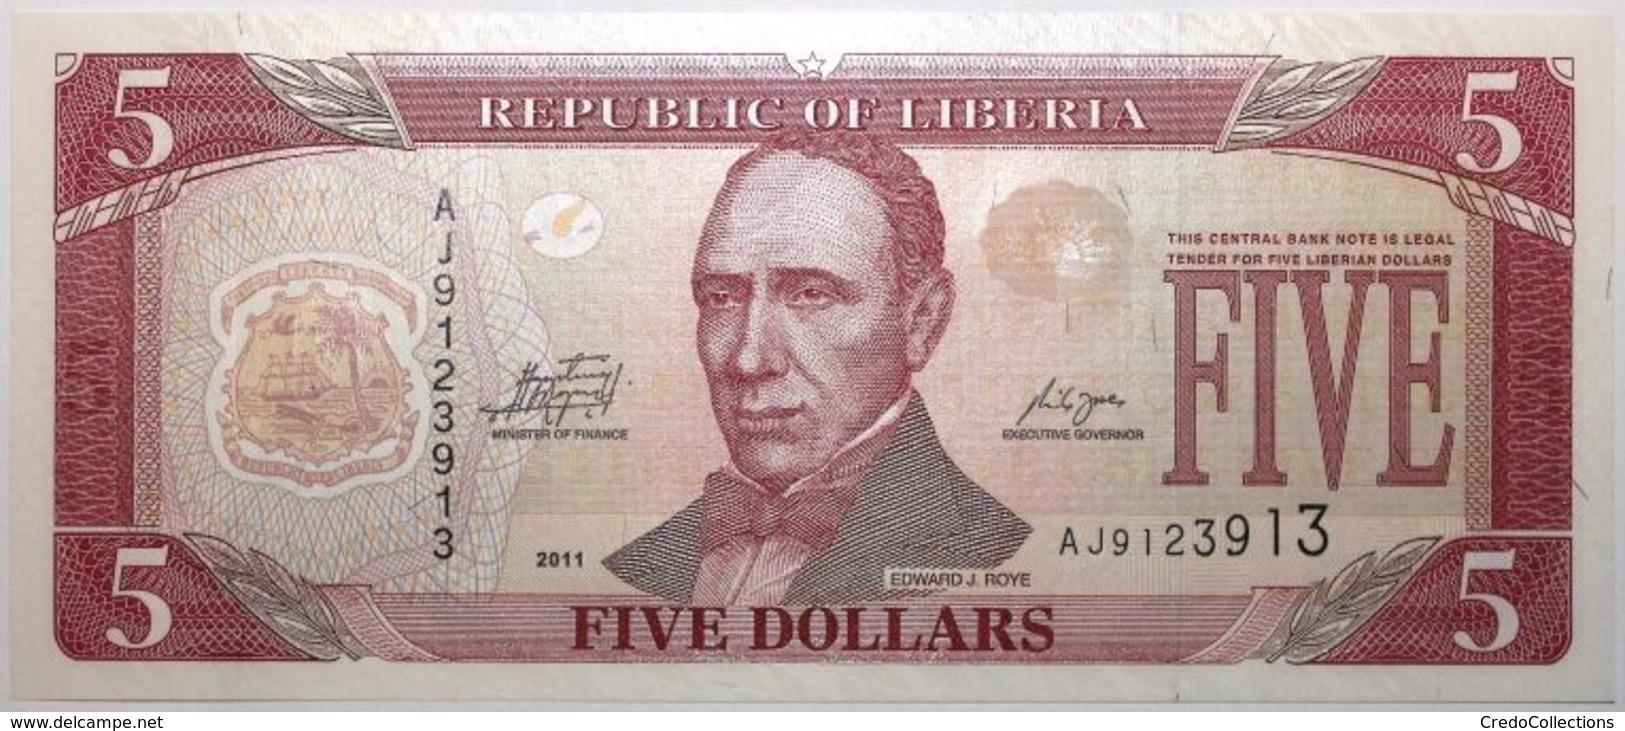 Liberia - 5 Dollars - 2011 - PICK 26g - NEUF - Liberia